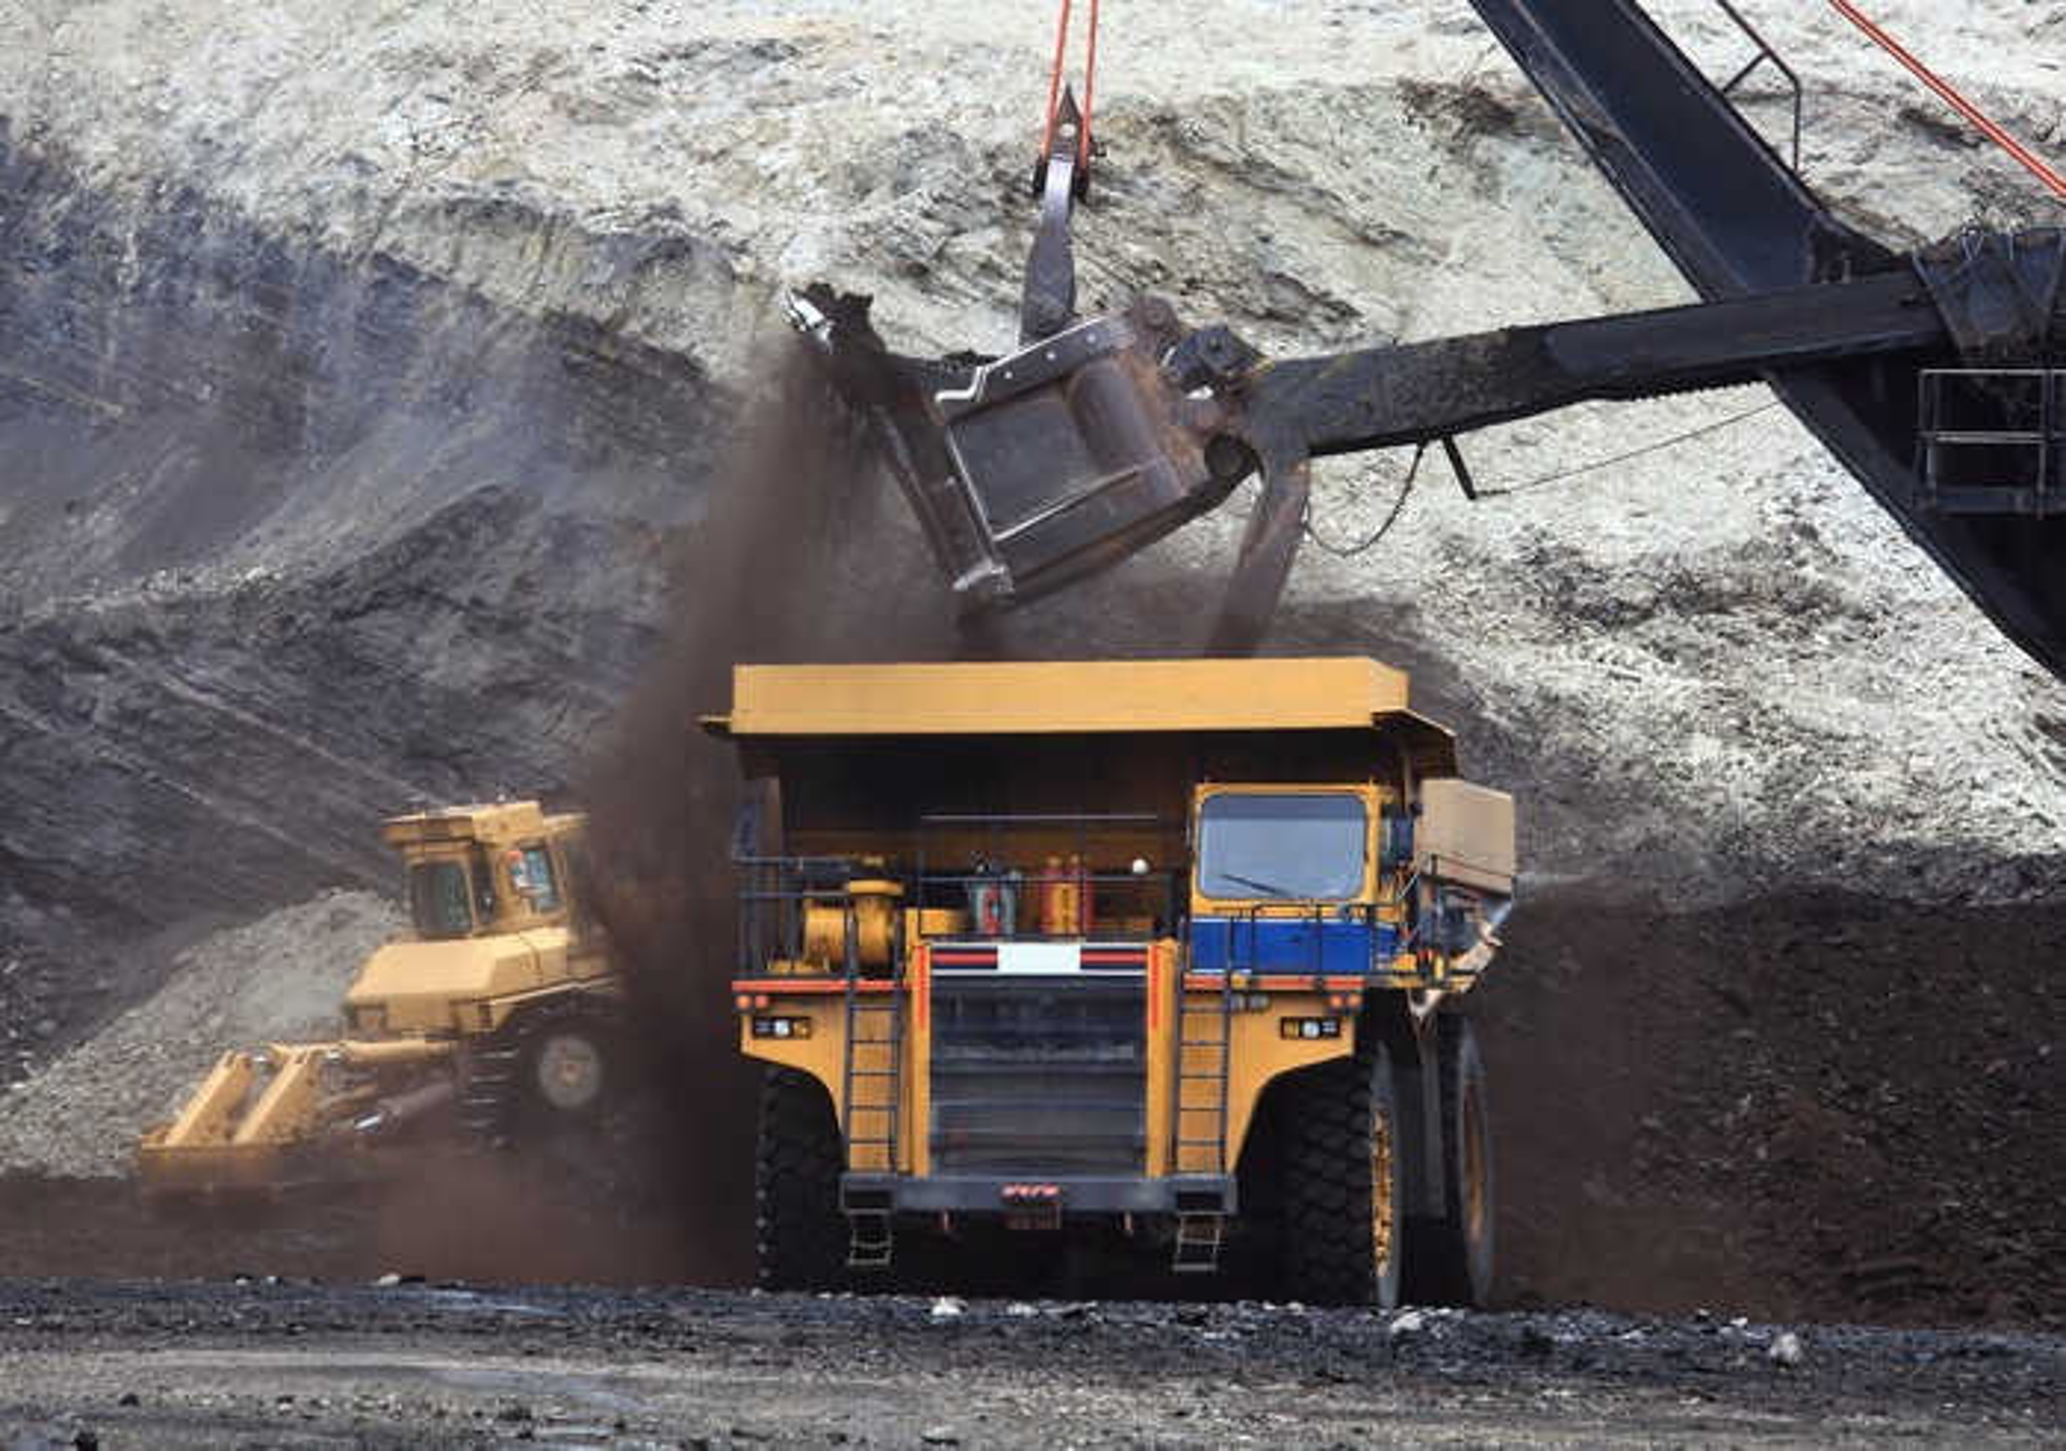 Mining excavator filling a dump truck.